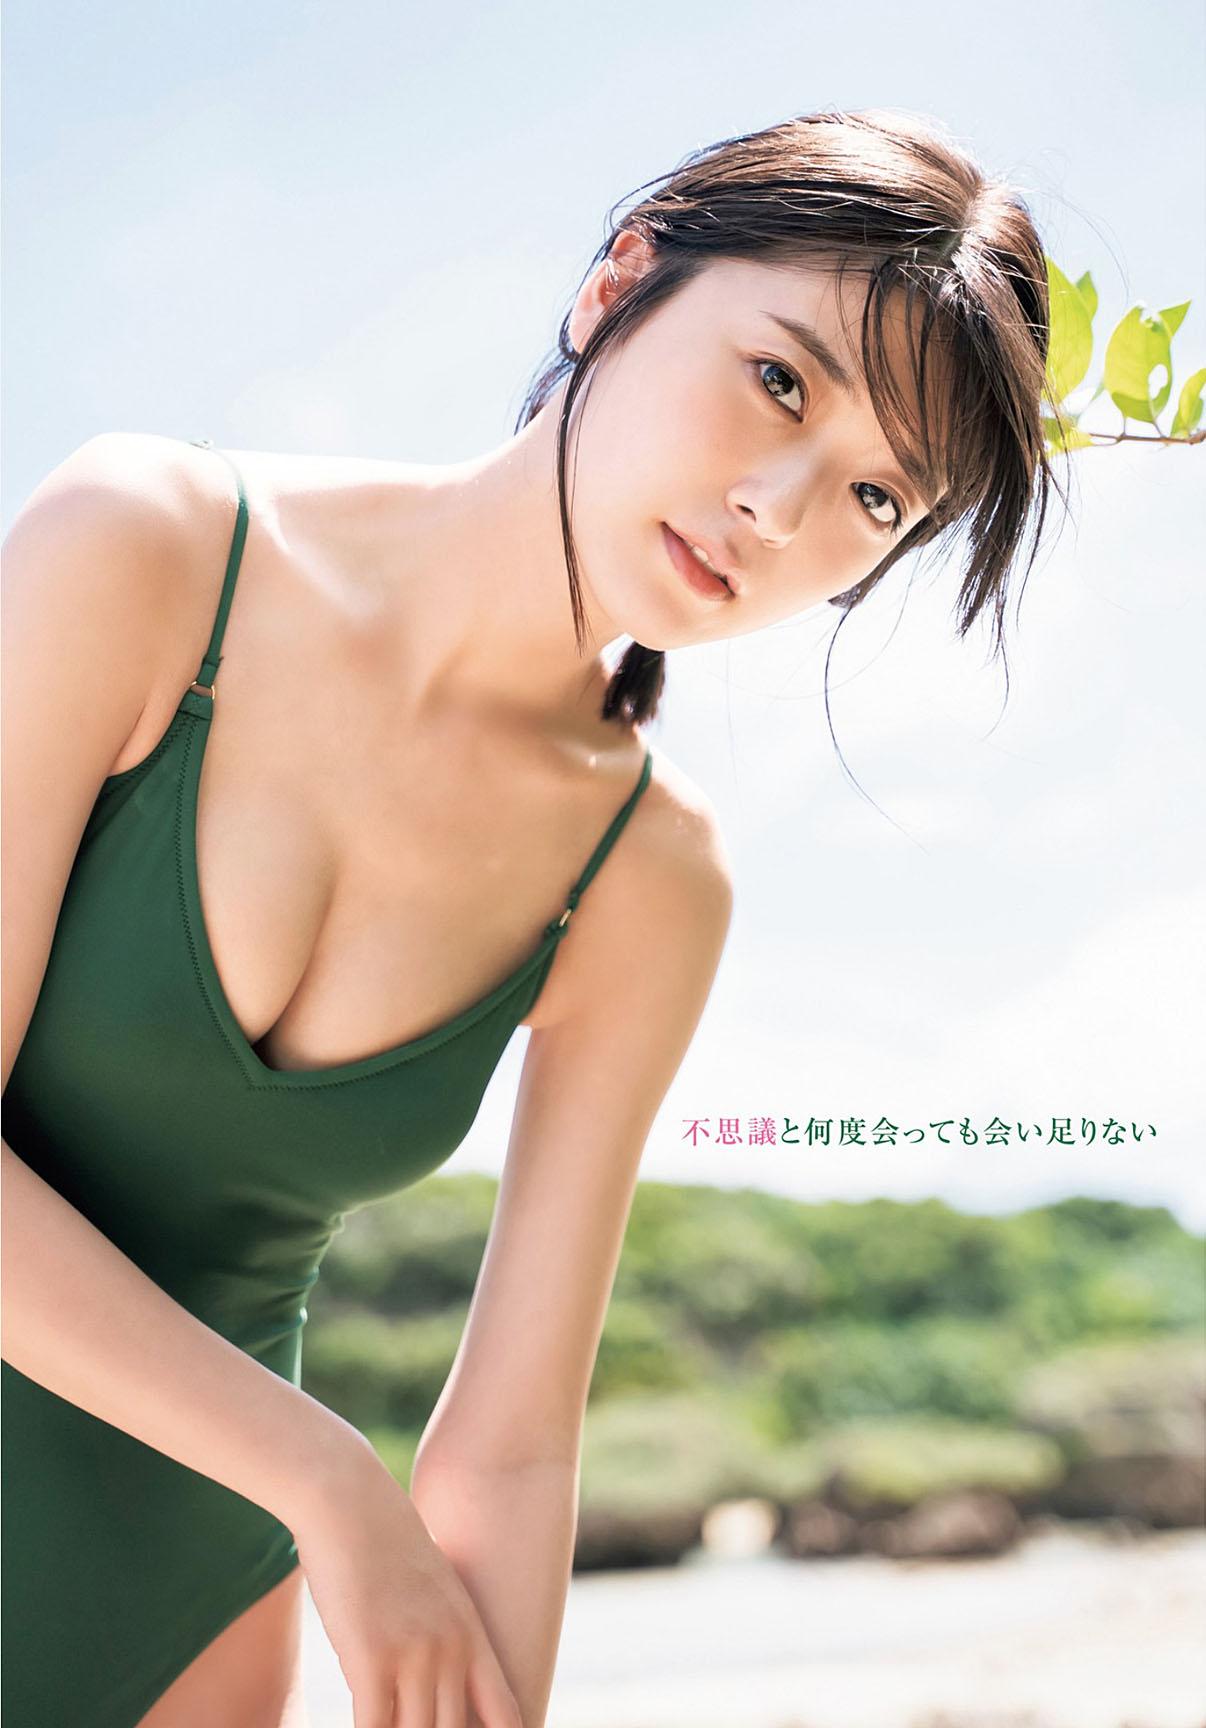 Kudo Mio Young Jump 210916 02.jpg